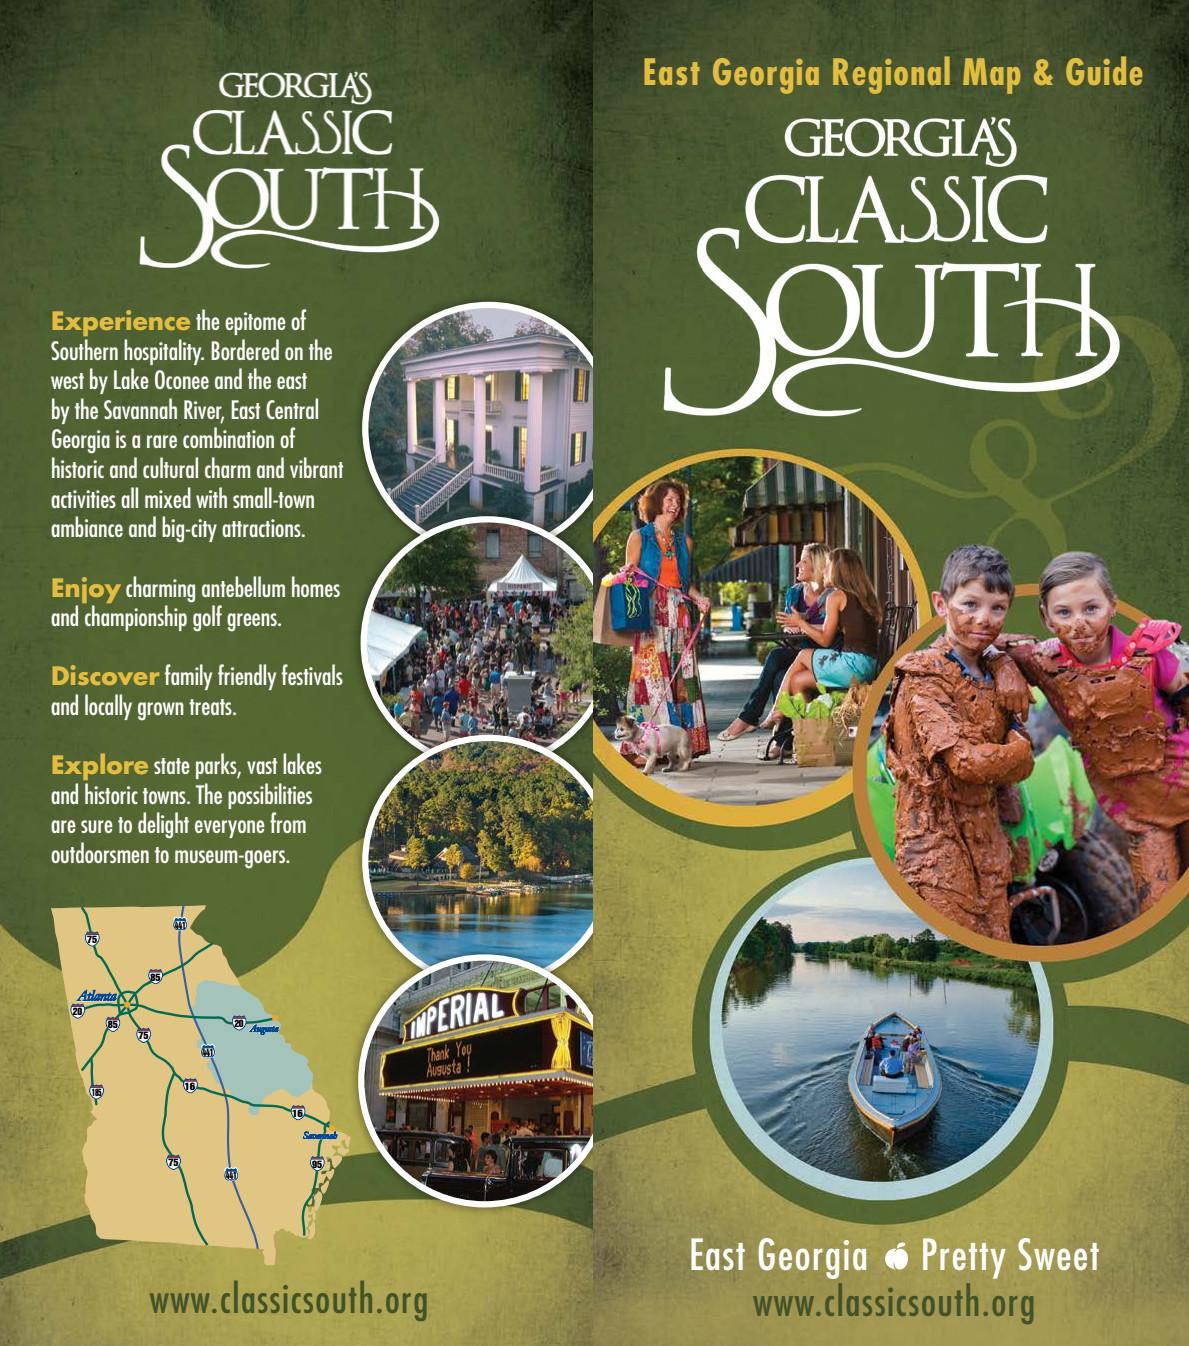 Map Of East Georgia.Georgia S Classic South East Georgia Regional Map Guide Official